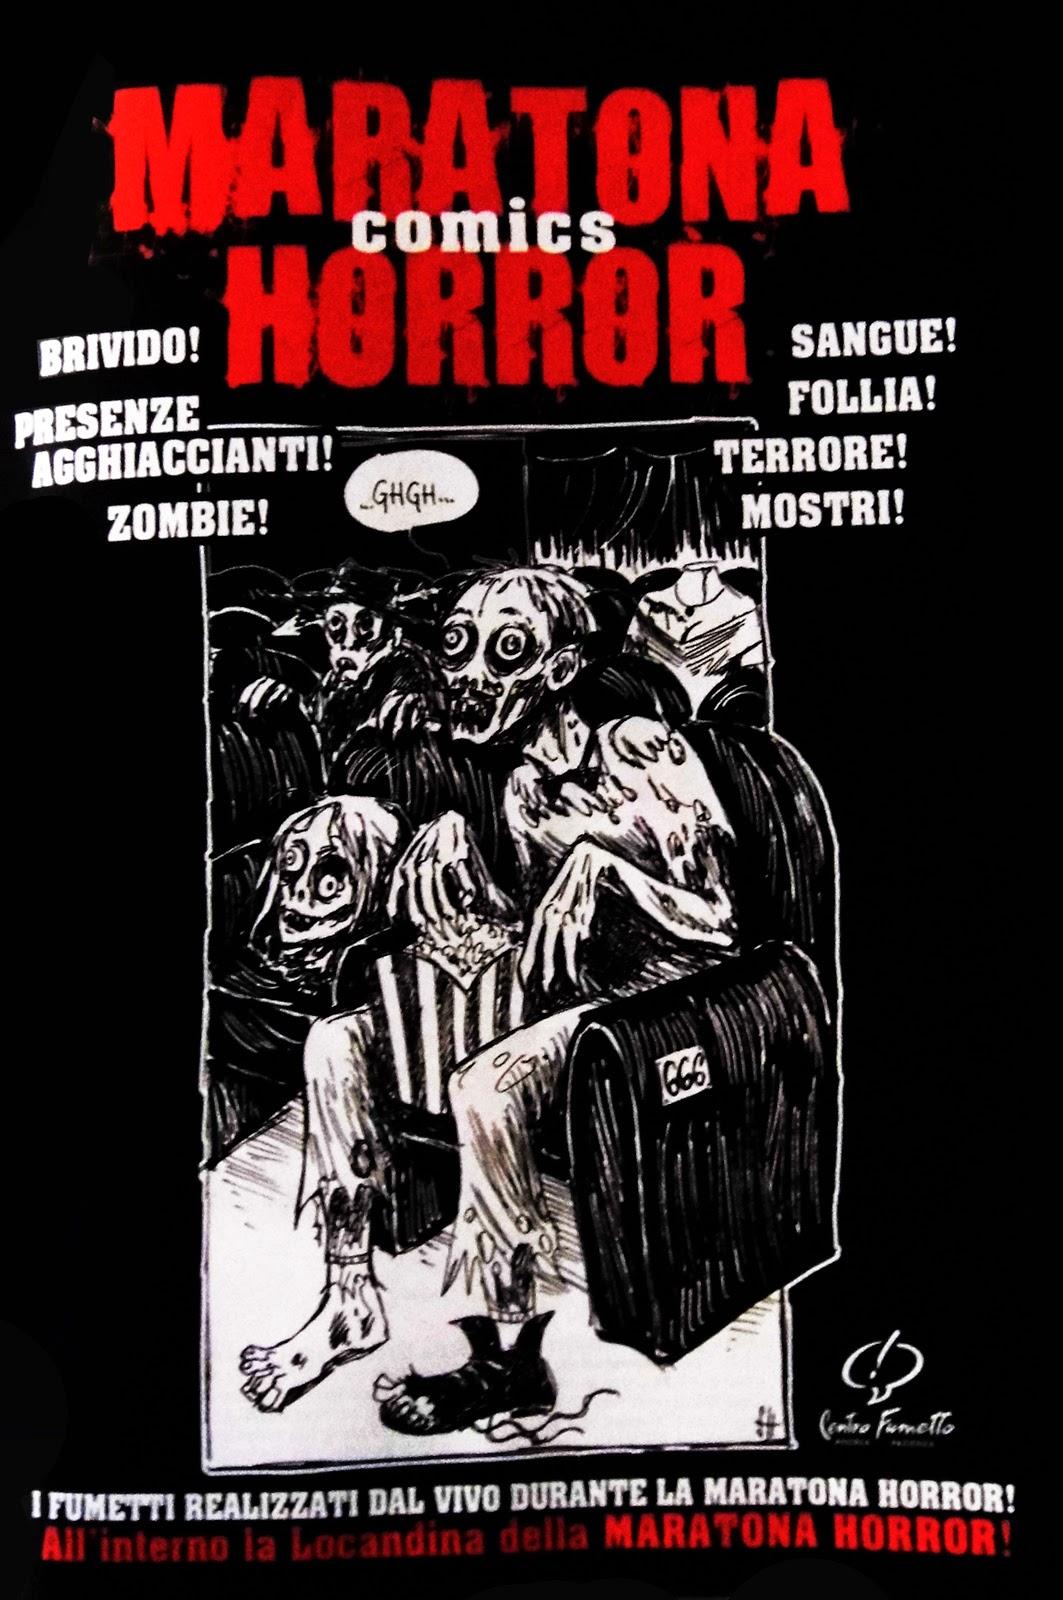 Maratona Horror Comics